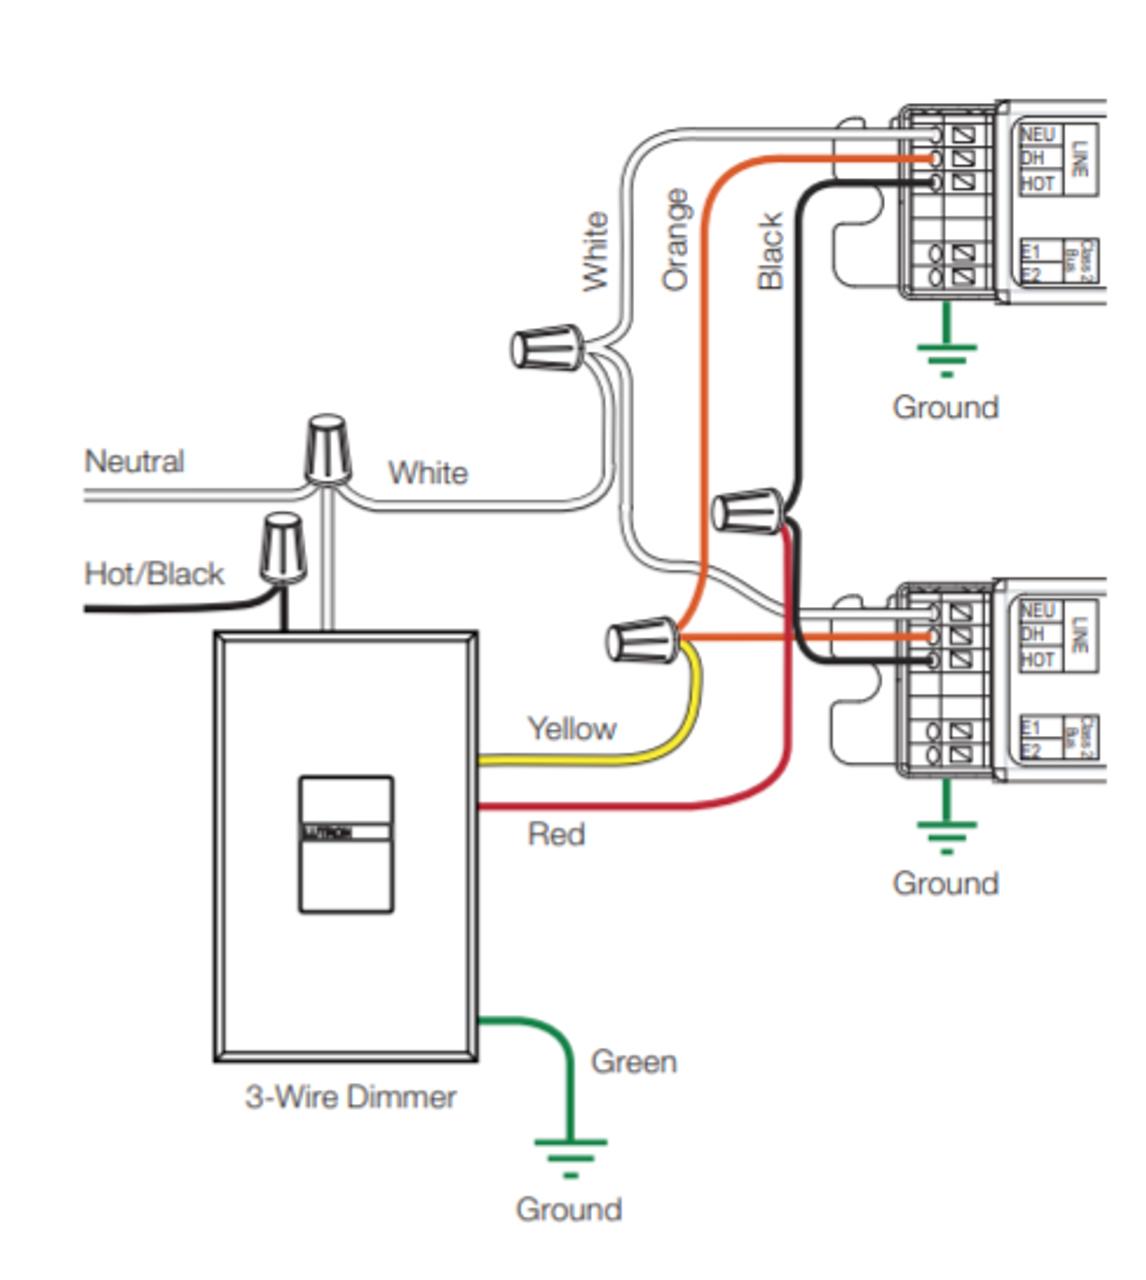 Lutron Dimmer Ballast Wiring Diagram - Take 3 Trailer Wiring Diagram -  usb-cable.yenpancane.jeanjaures37.frWiring Diagram Resource